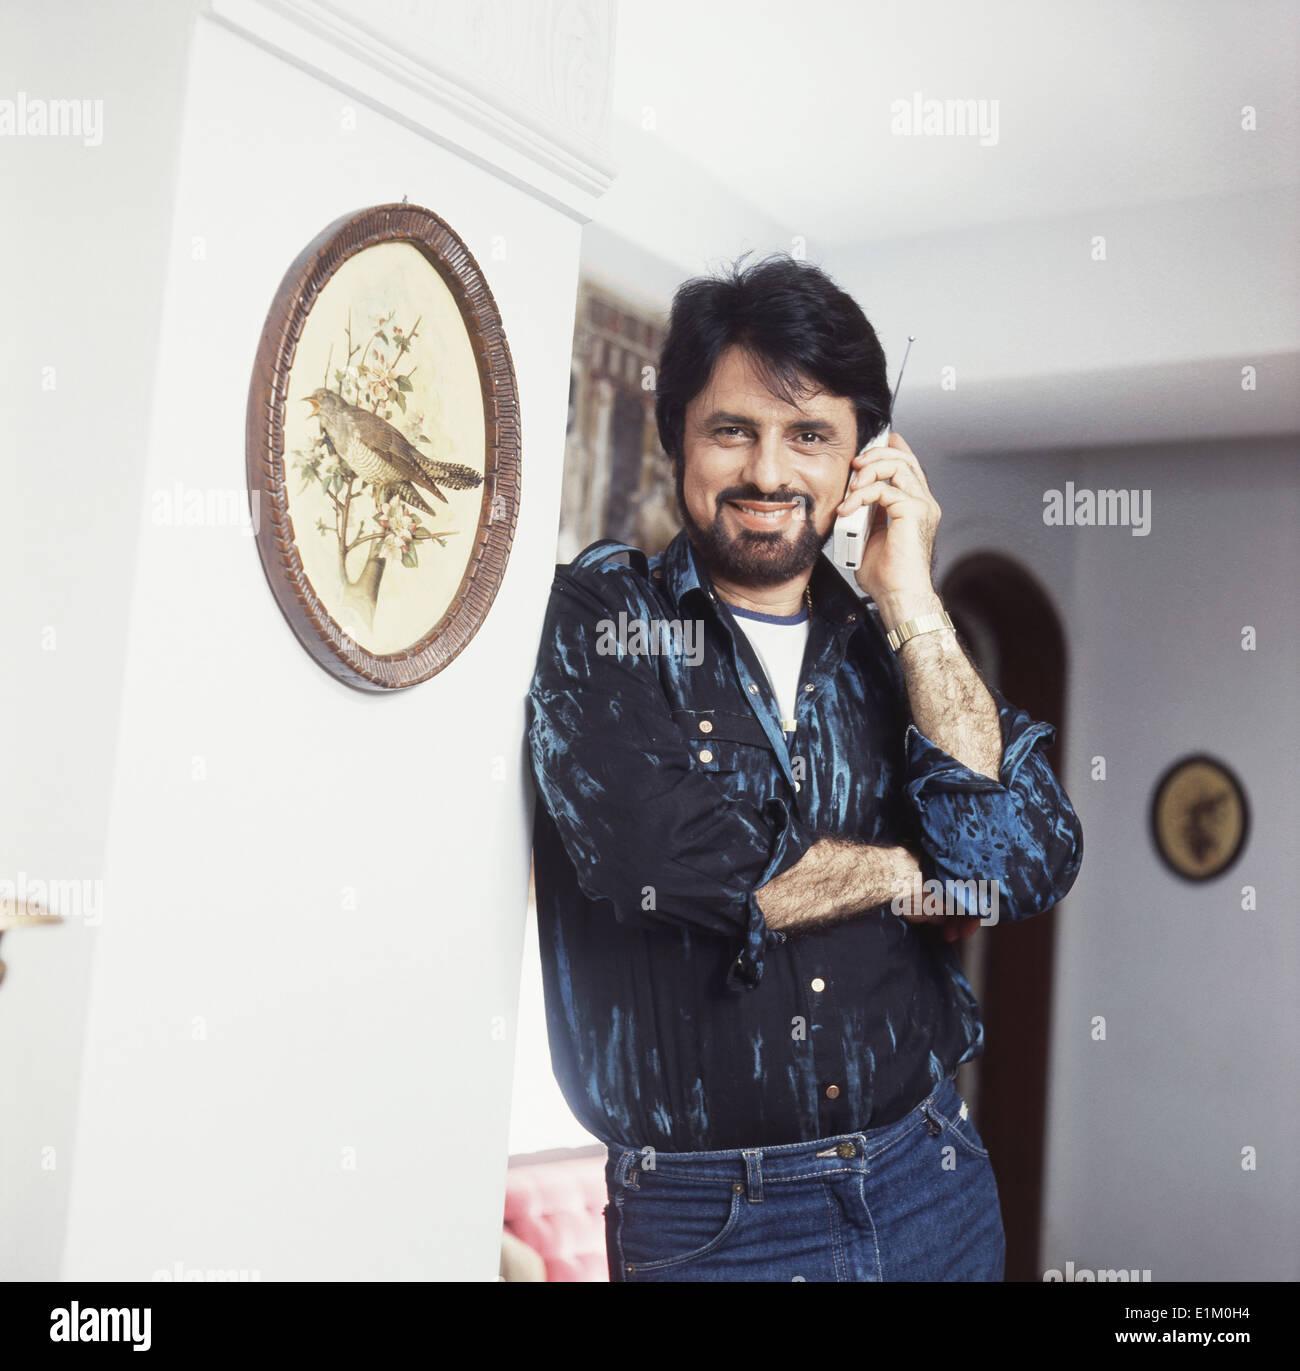 sanjay khan zeenat aman episode